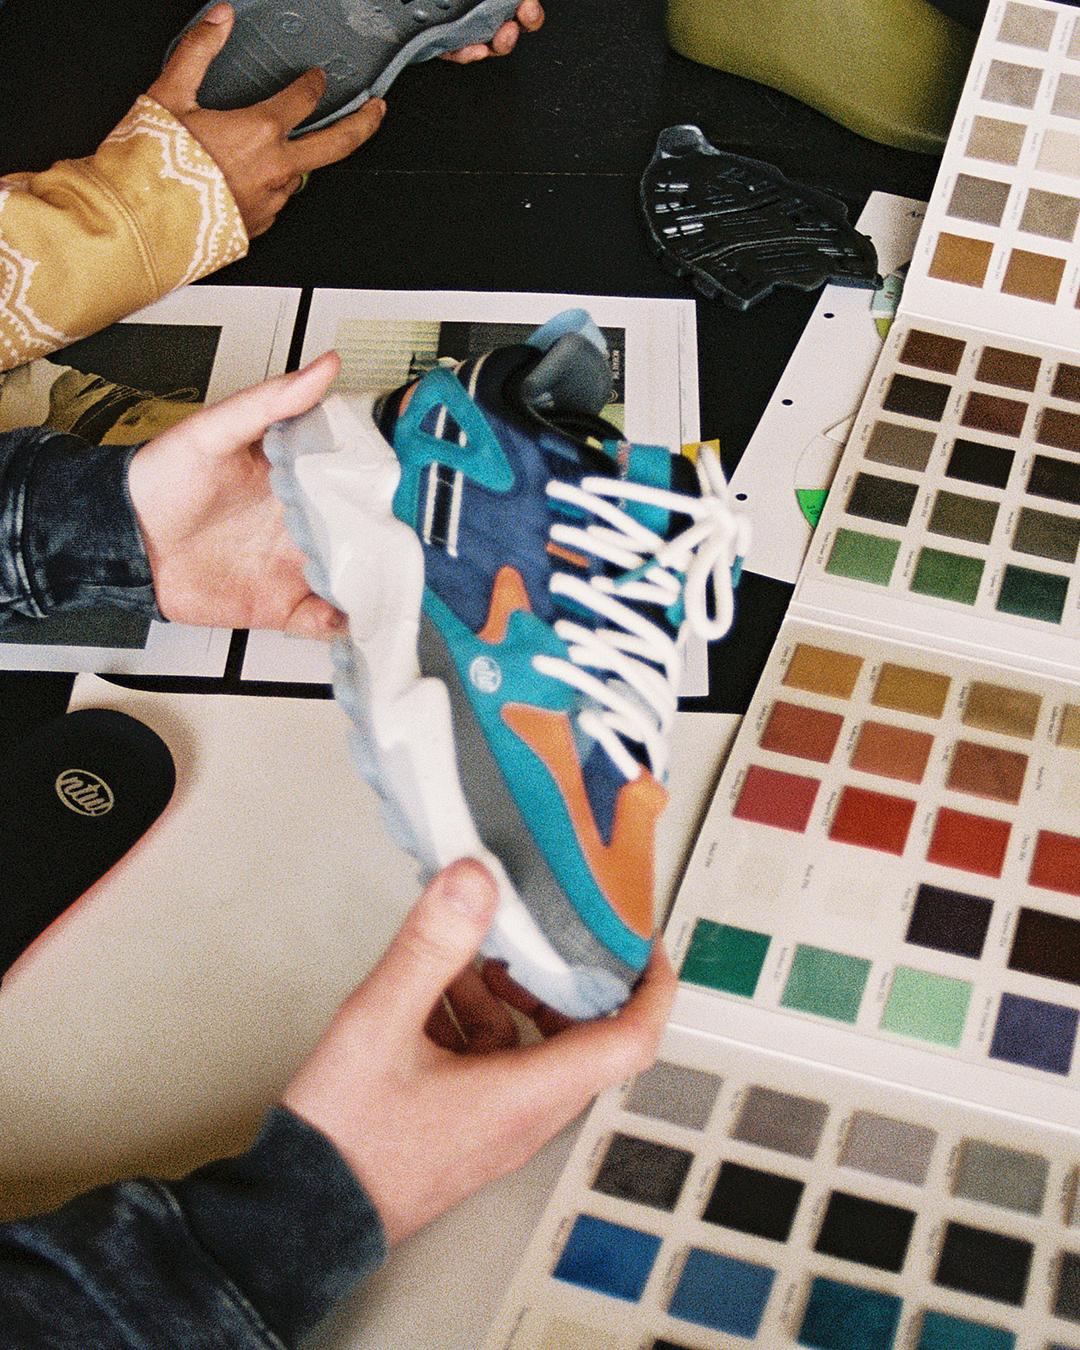 NOTWOWAYS sneakers interview Laura Aguilera